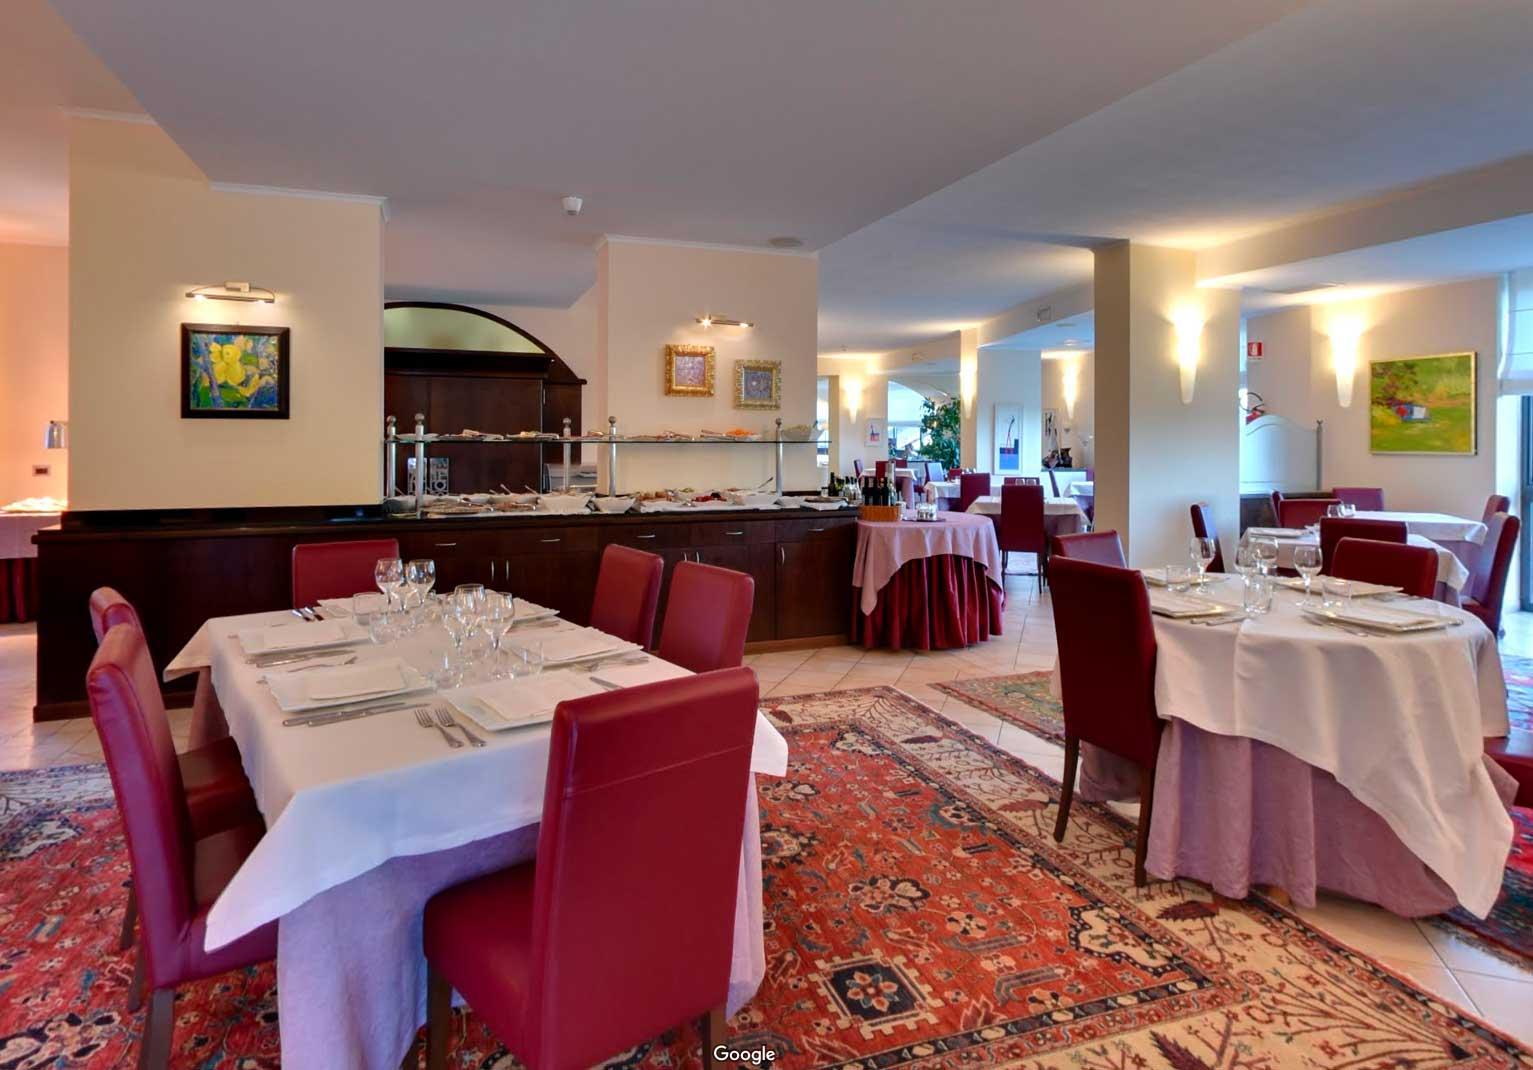 Ristorante Park Hotel Argento – Google Street View